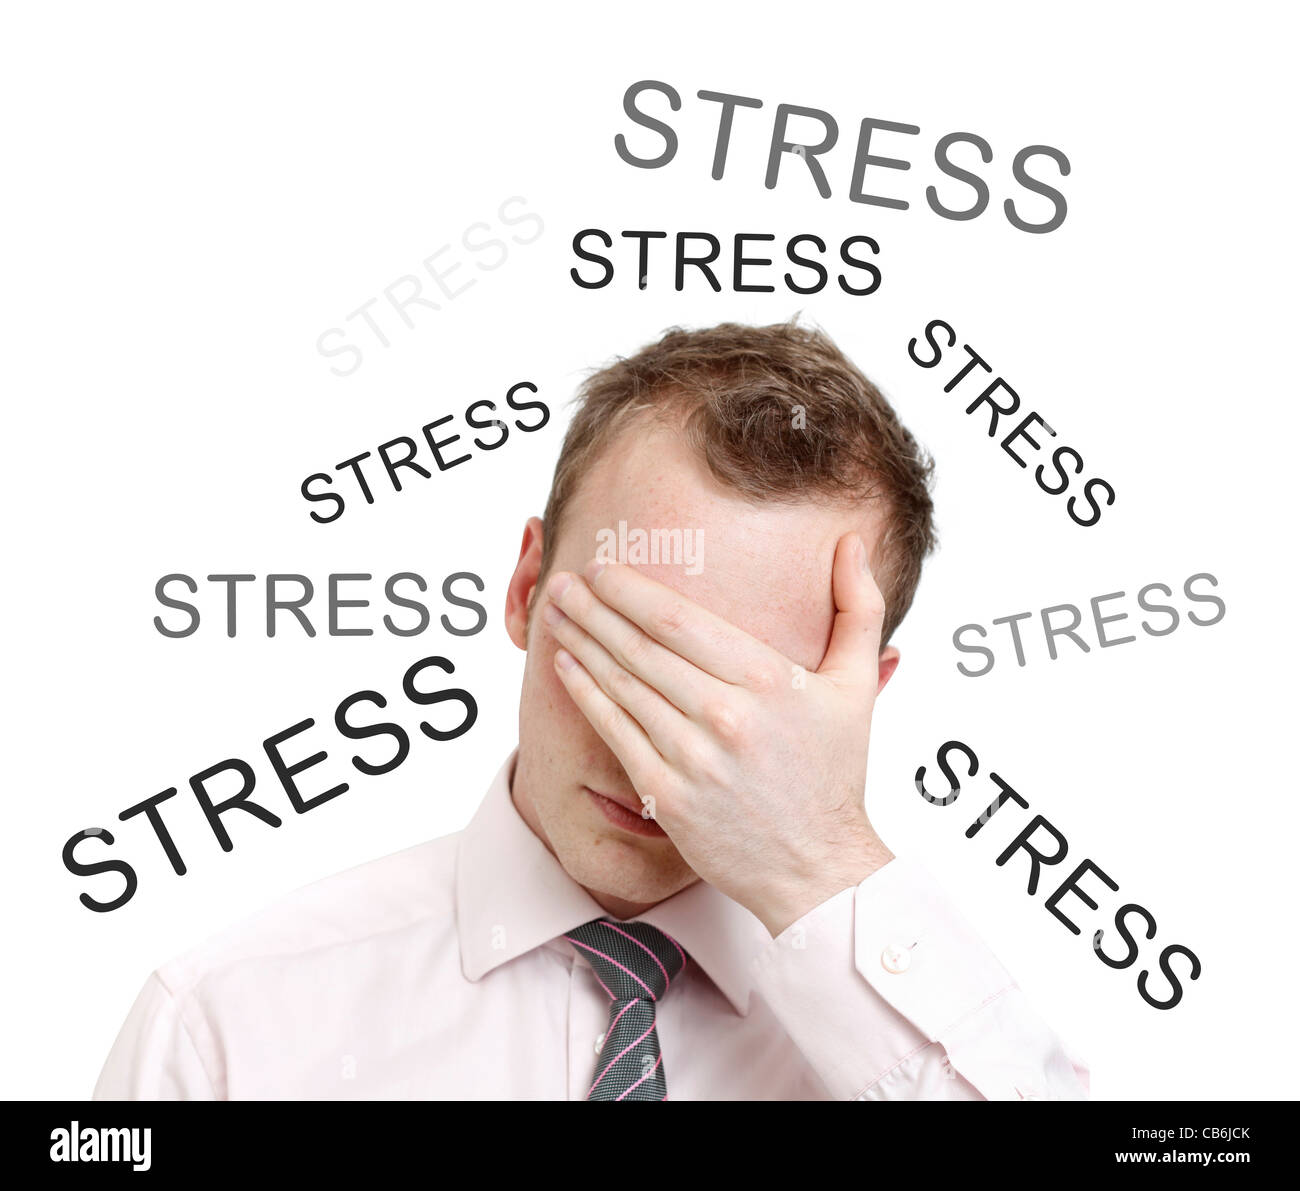 Estrés Imagen De Stock